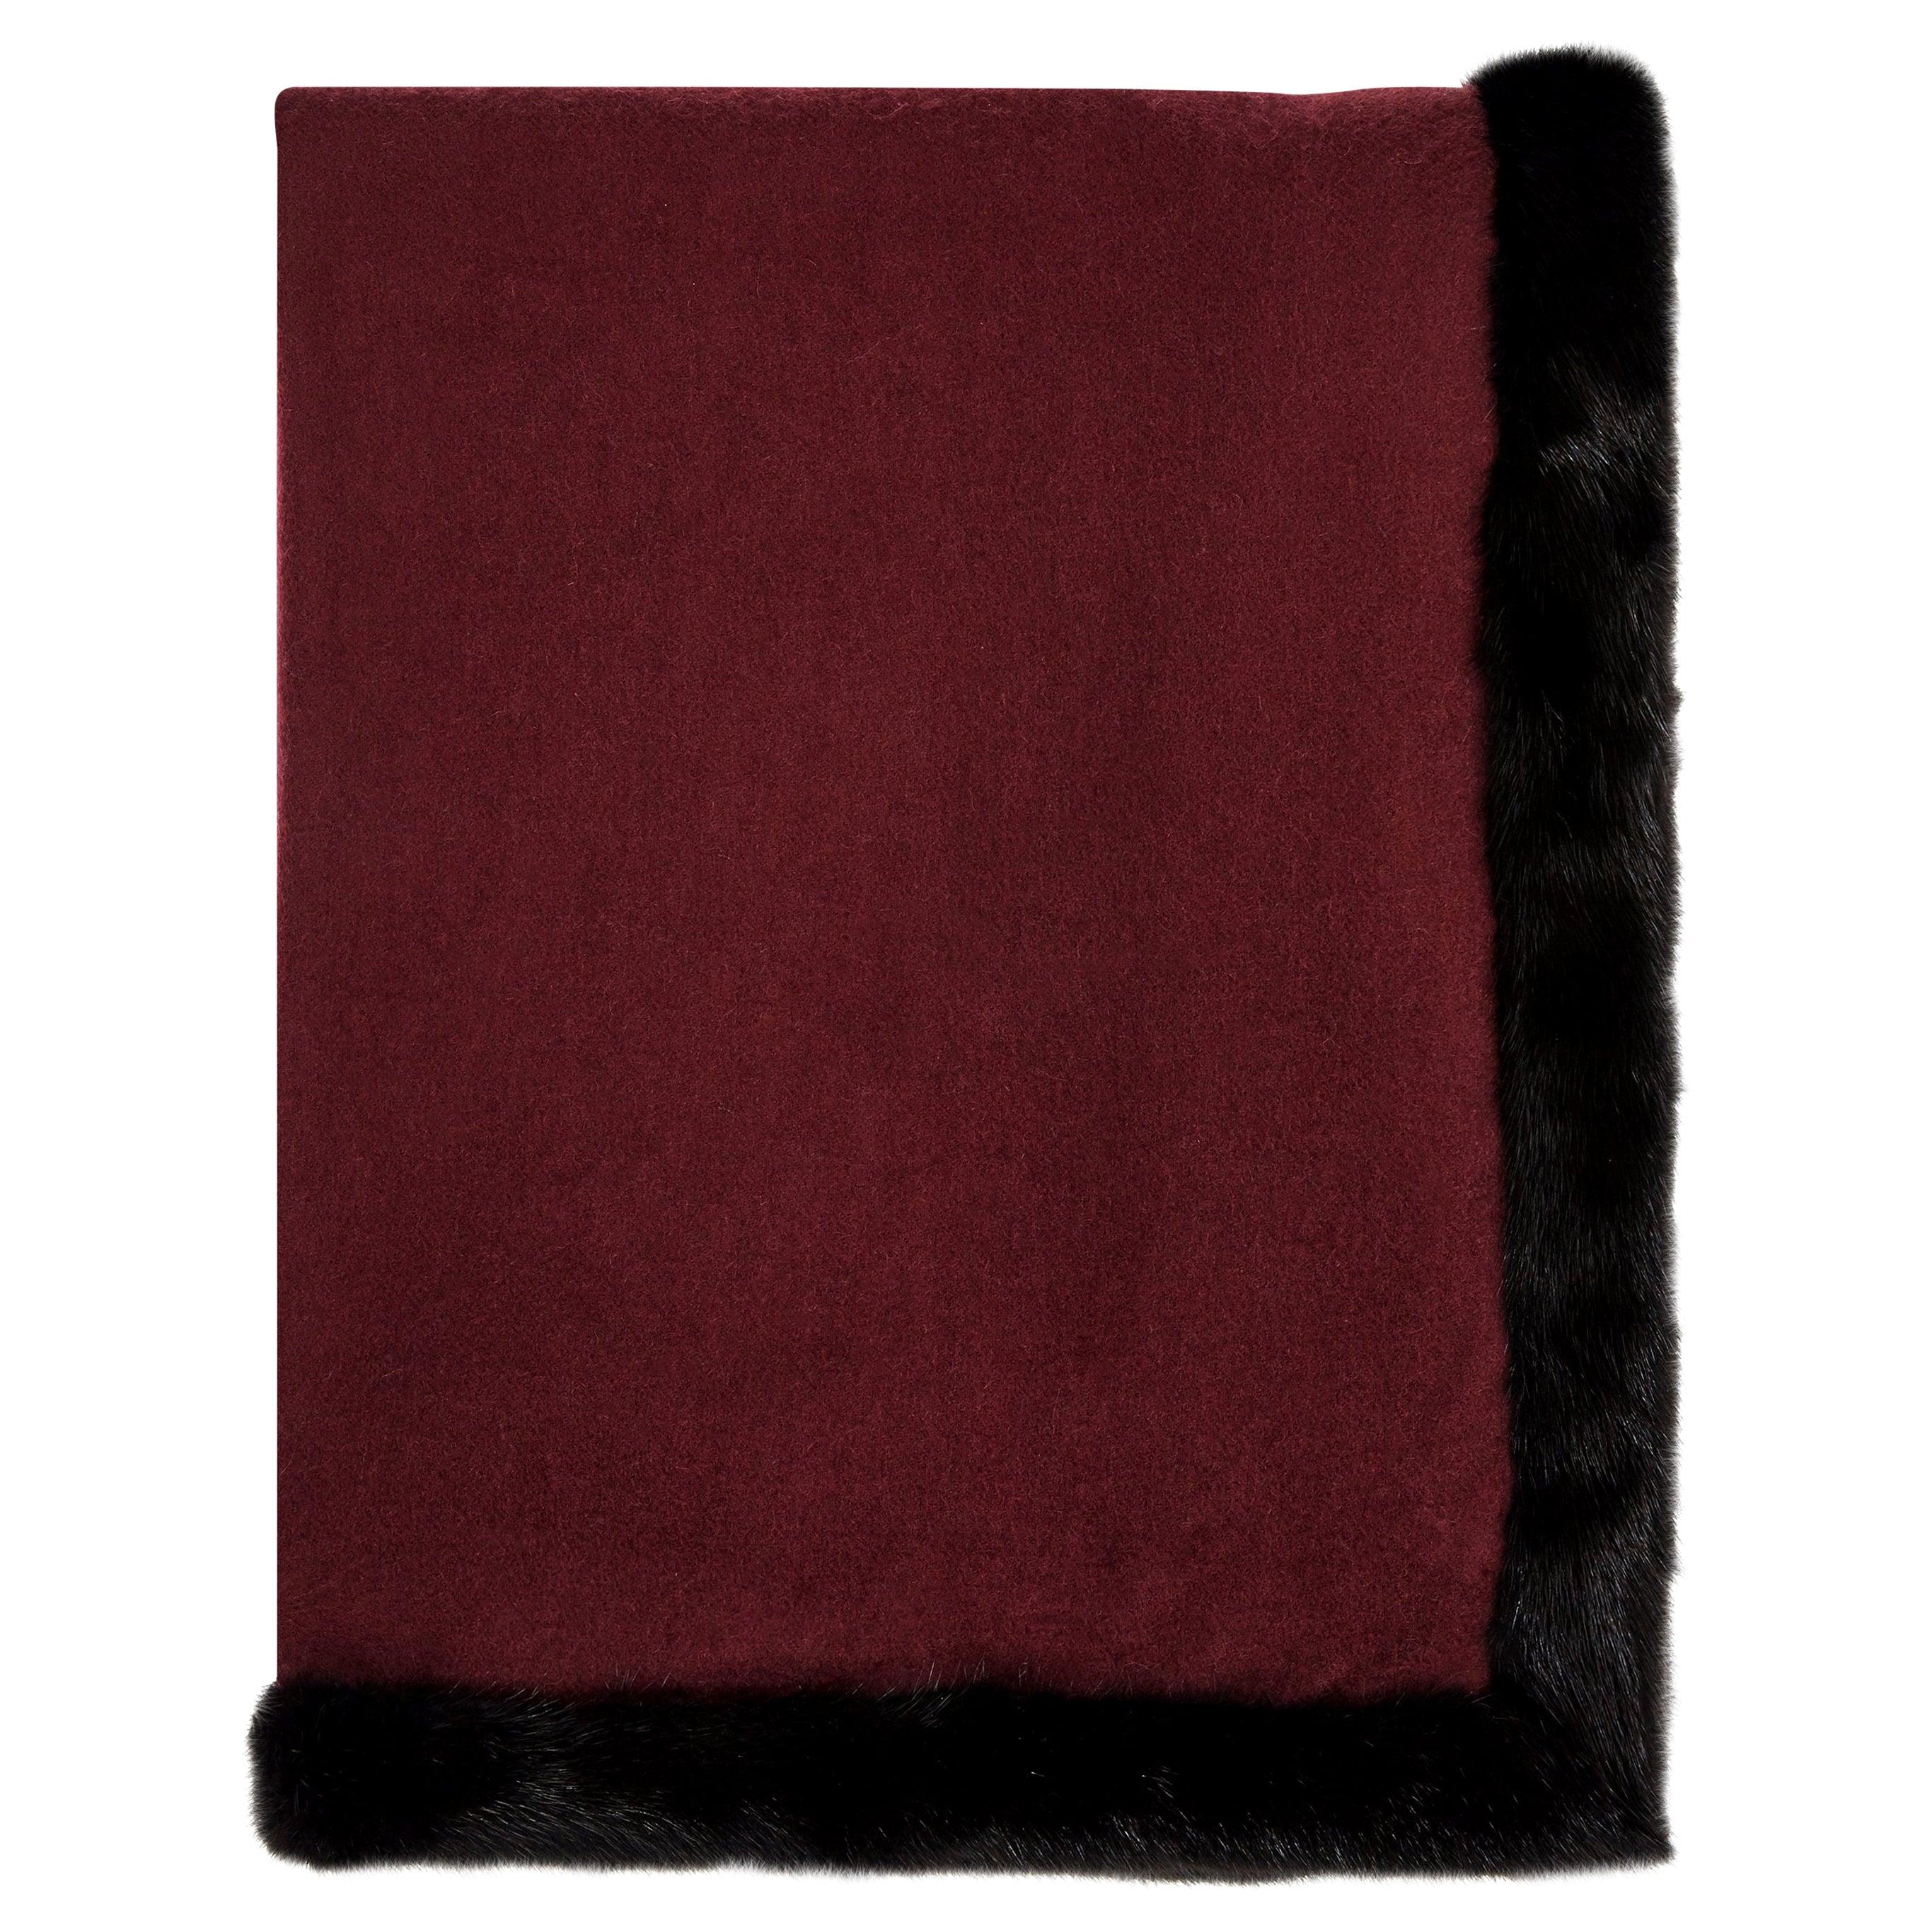 Verheyen London Mink Fur Trimmed Black & Burgundy Cashmere Shawl